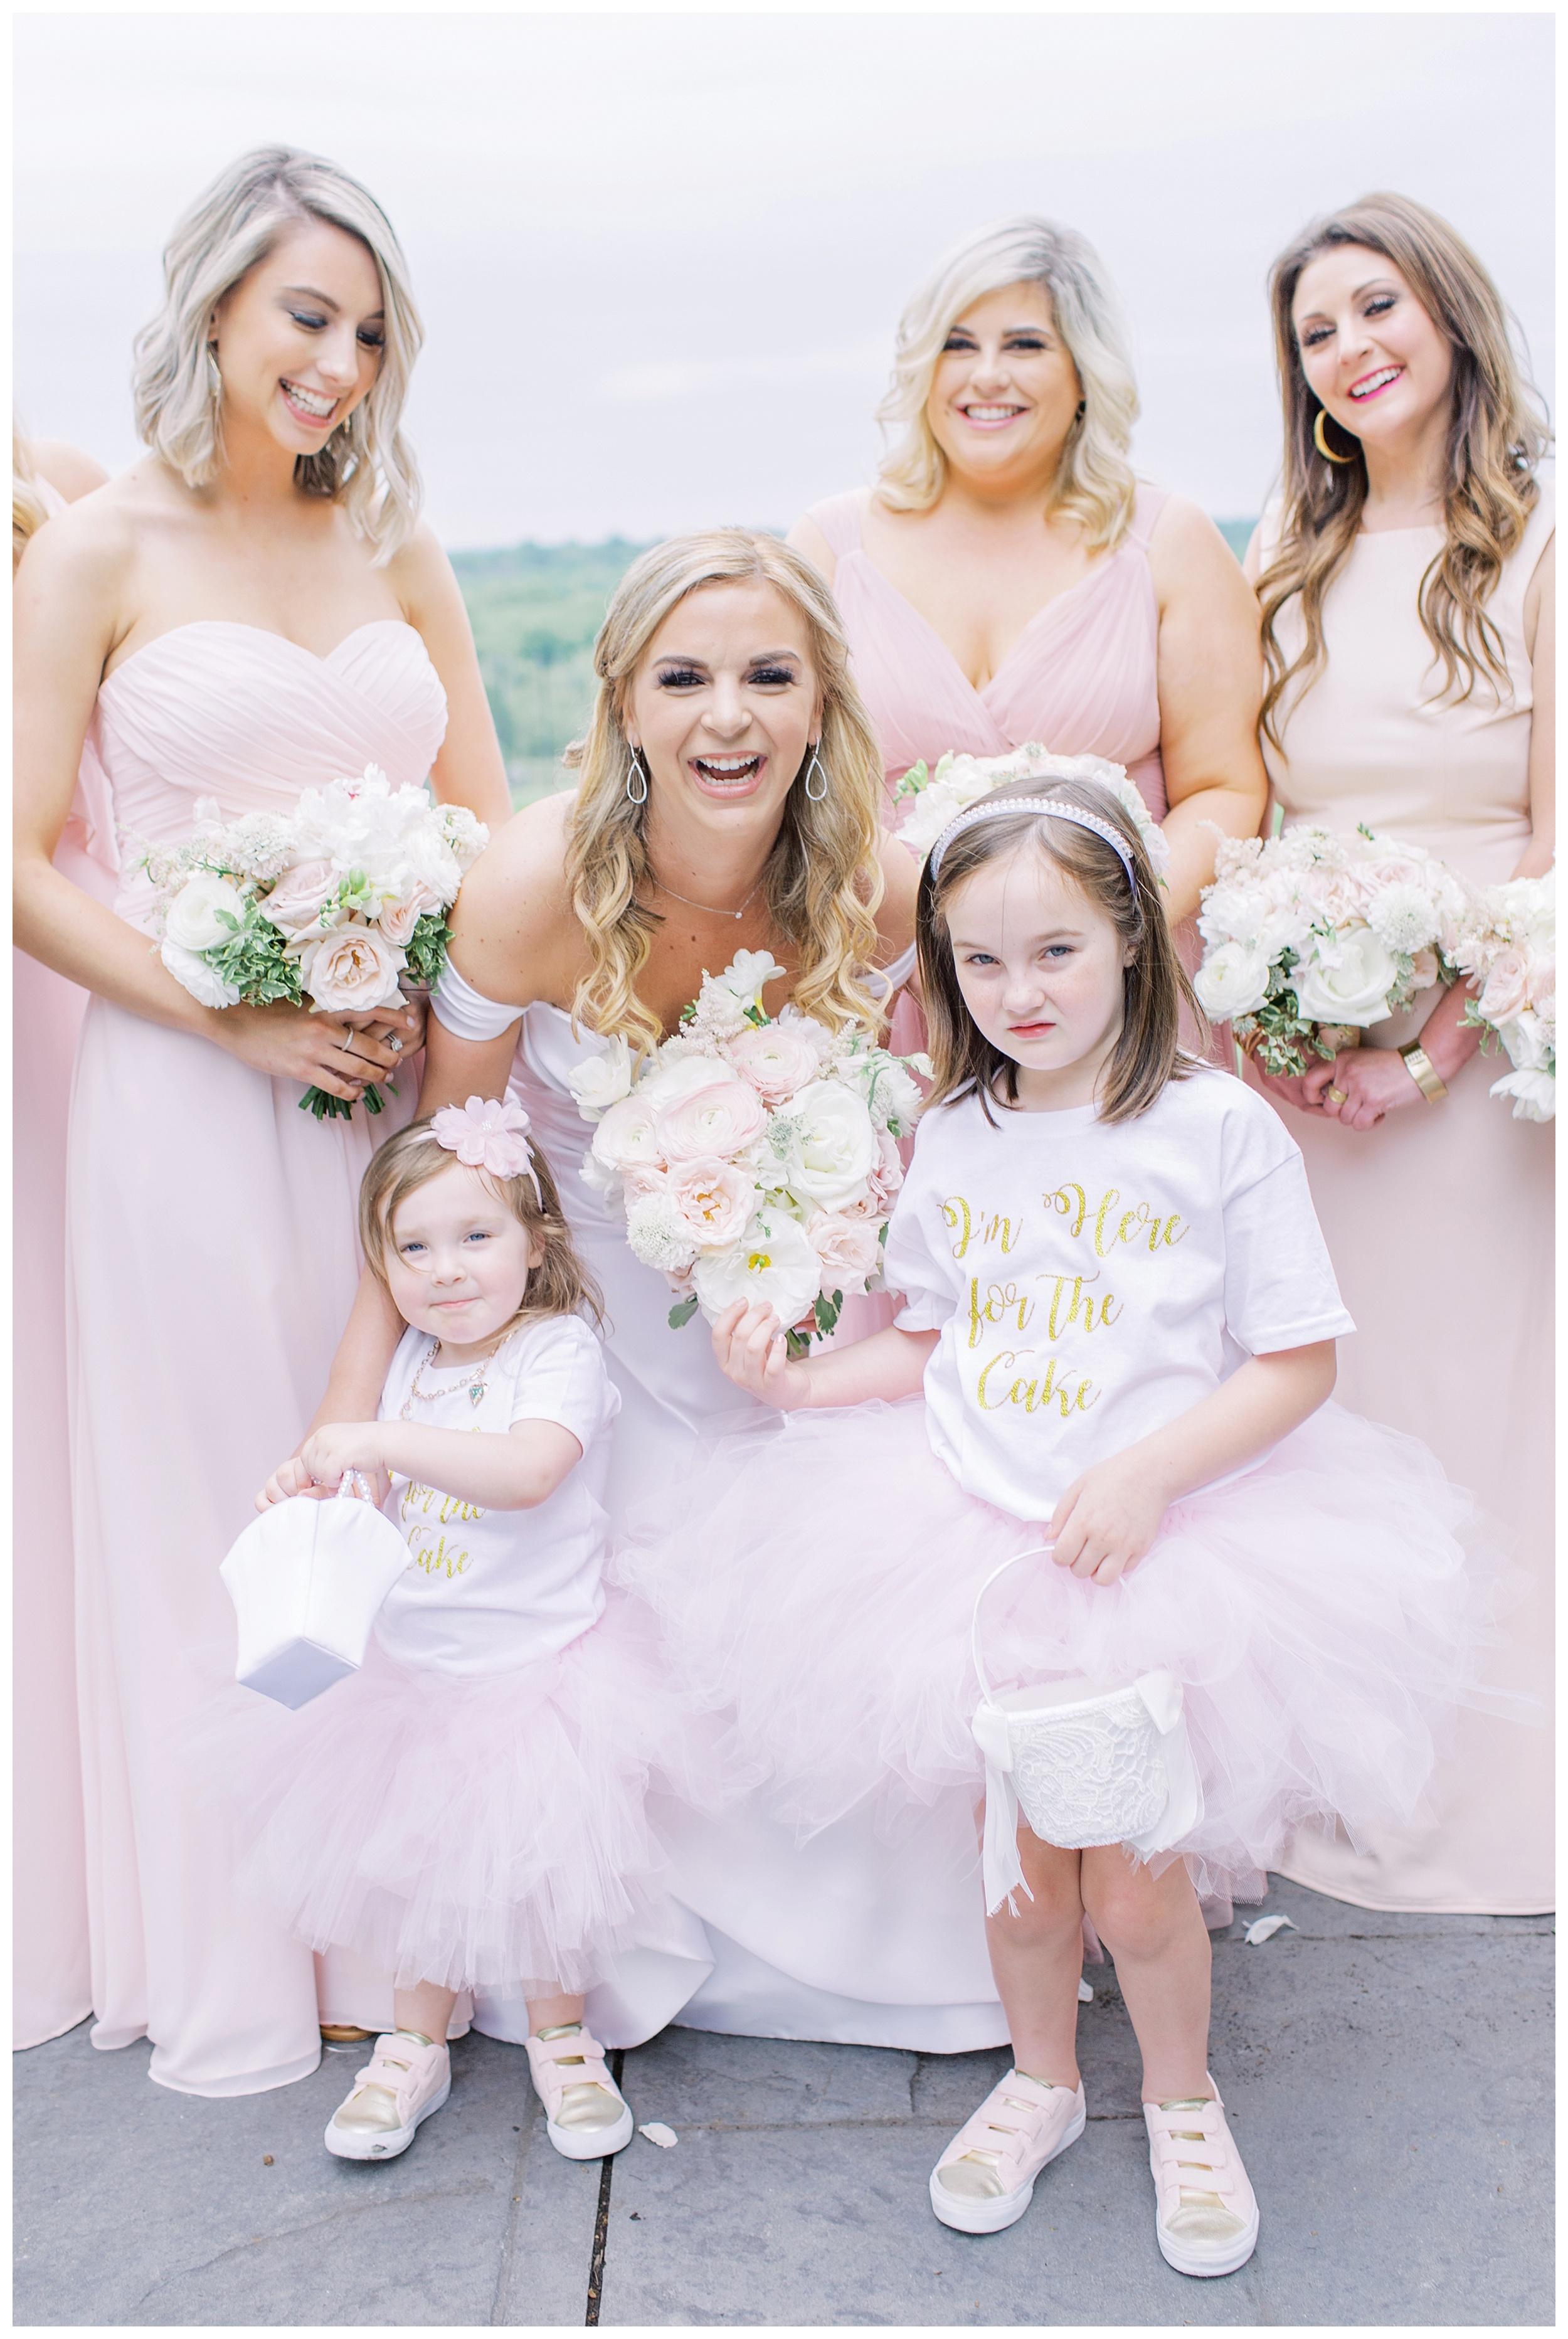 Lansdowne Resort Wedding | Virginia Film Wedding Photographer Kir Tuben_0024.jpg